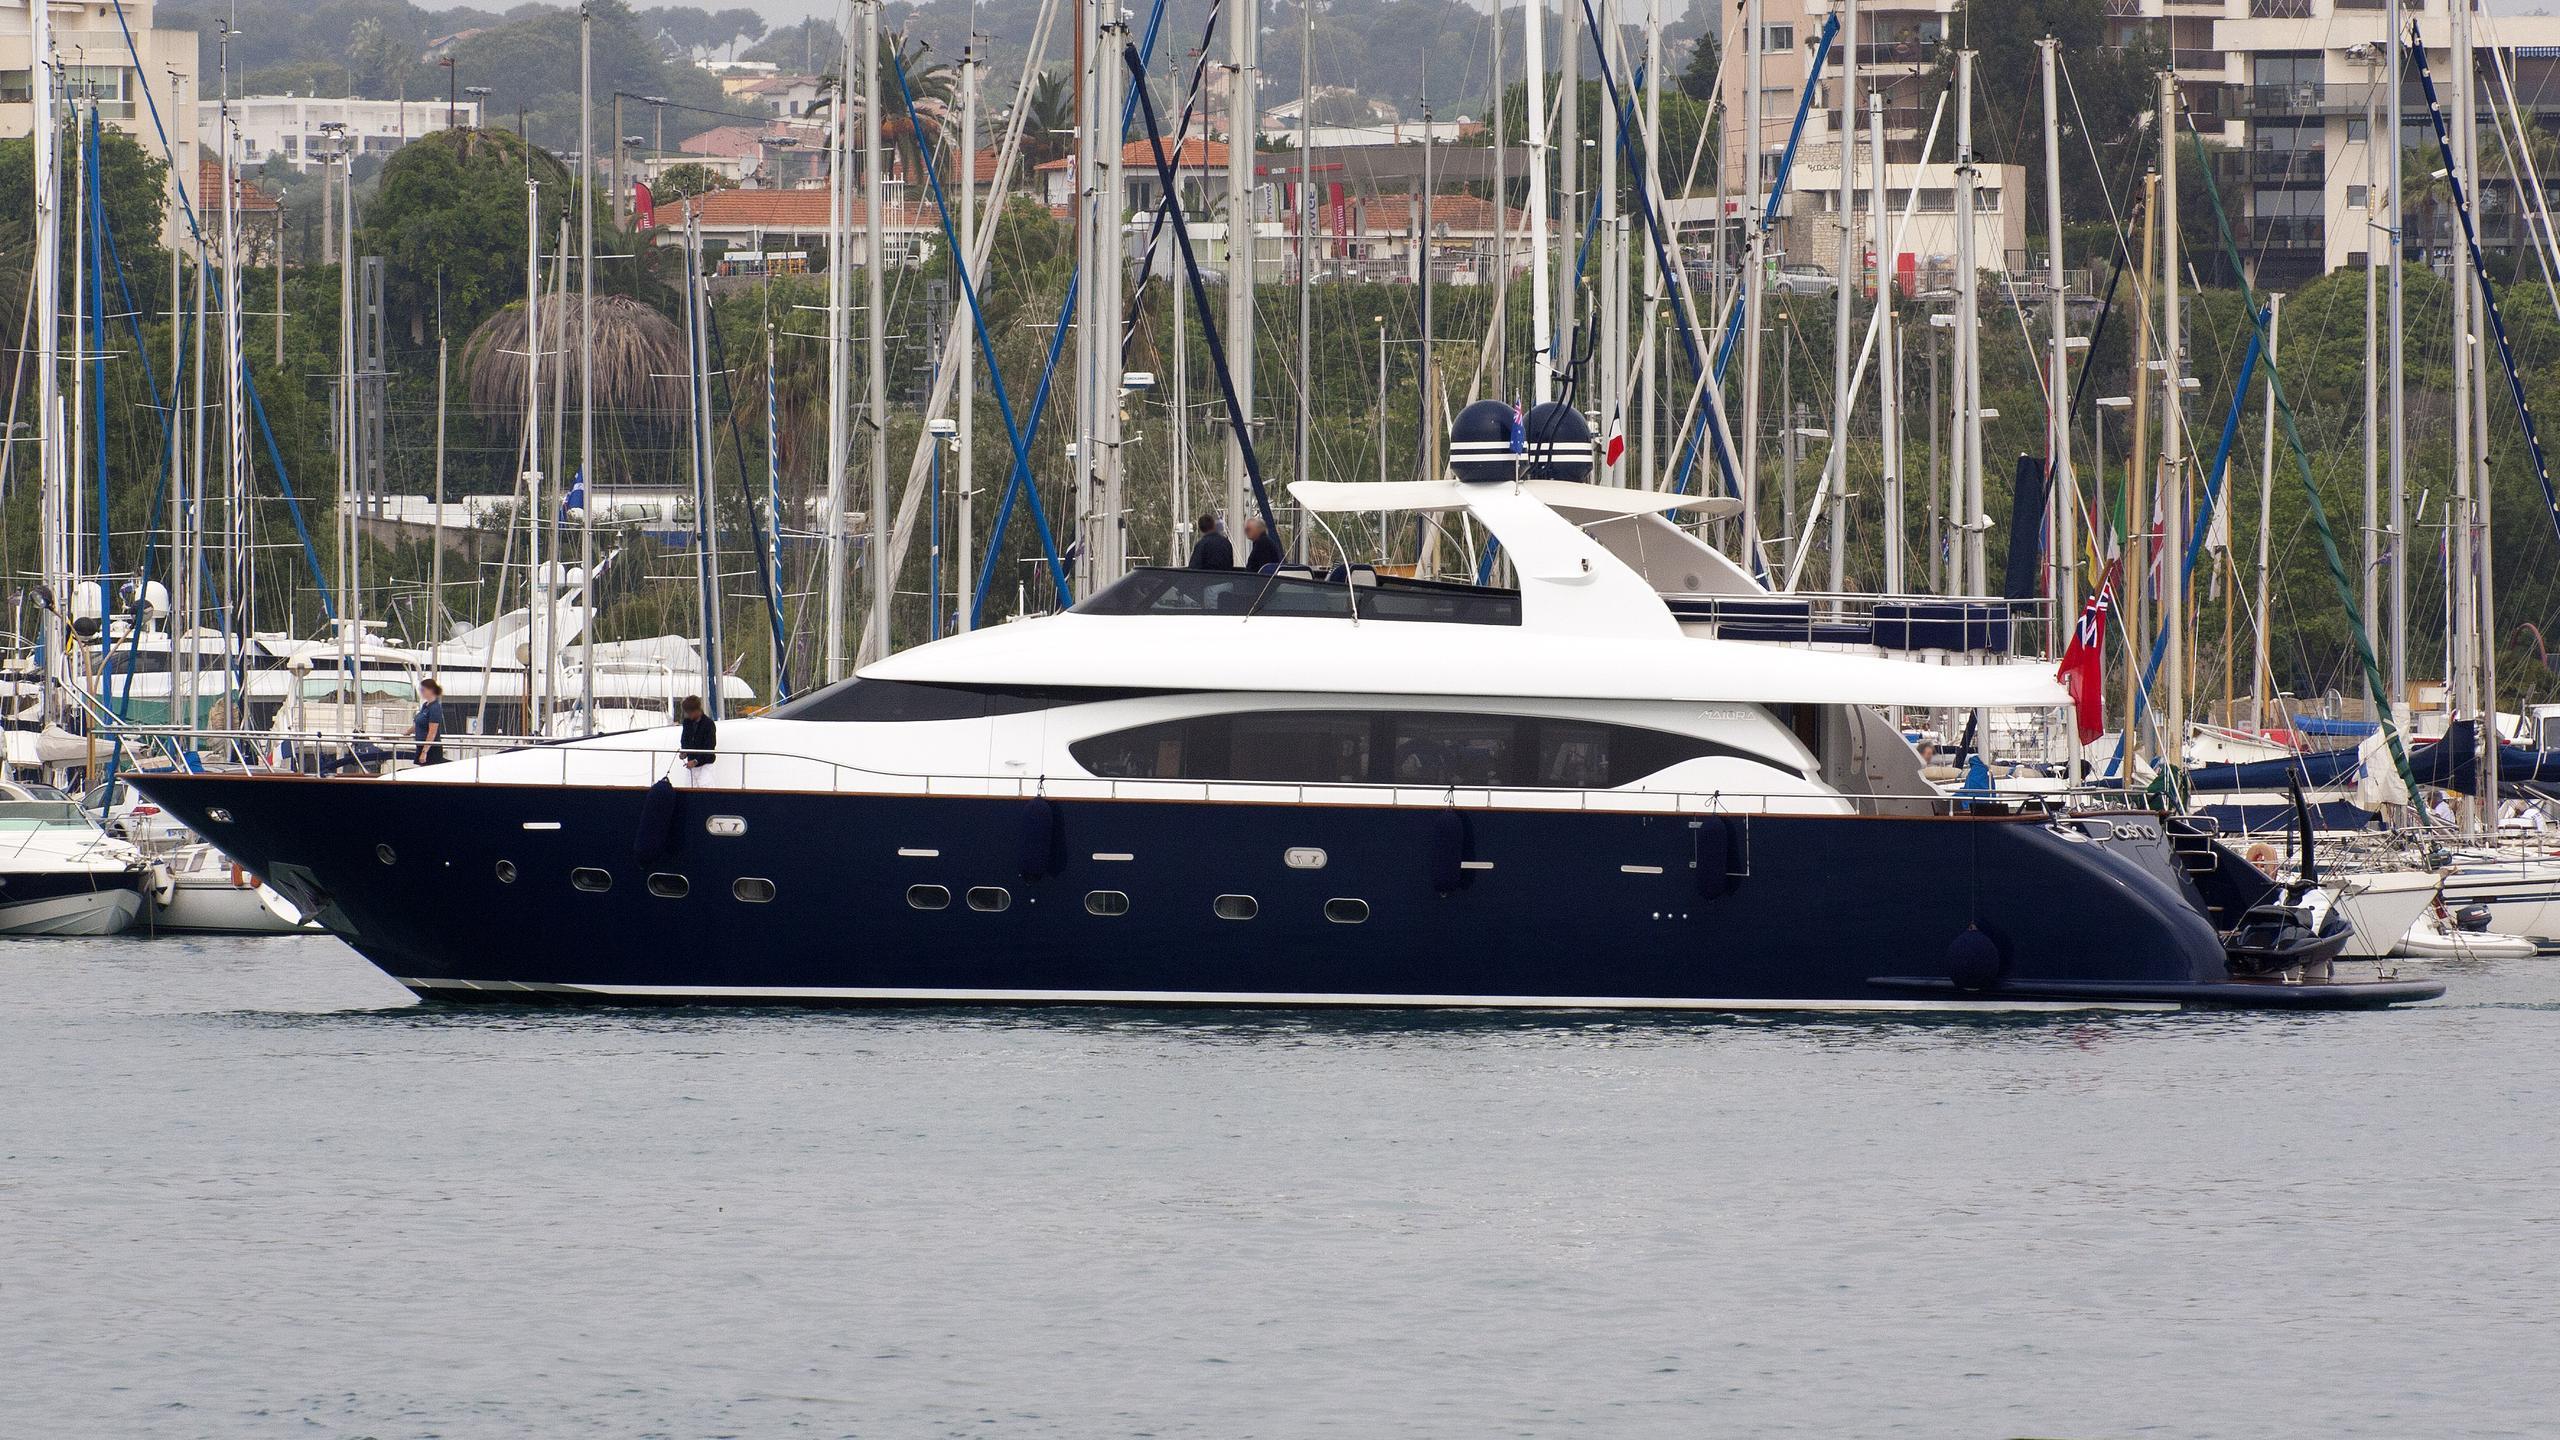 asha-motor-yacht-Maiora-27-2006-27m-profile